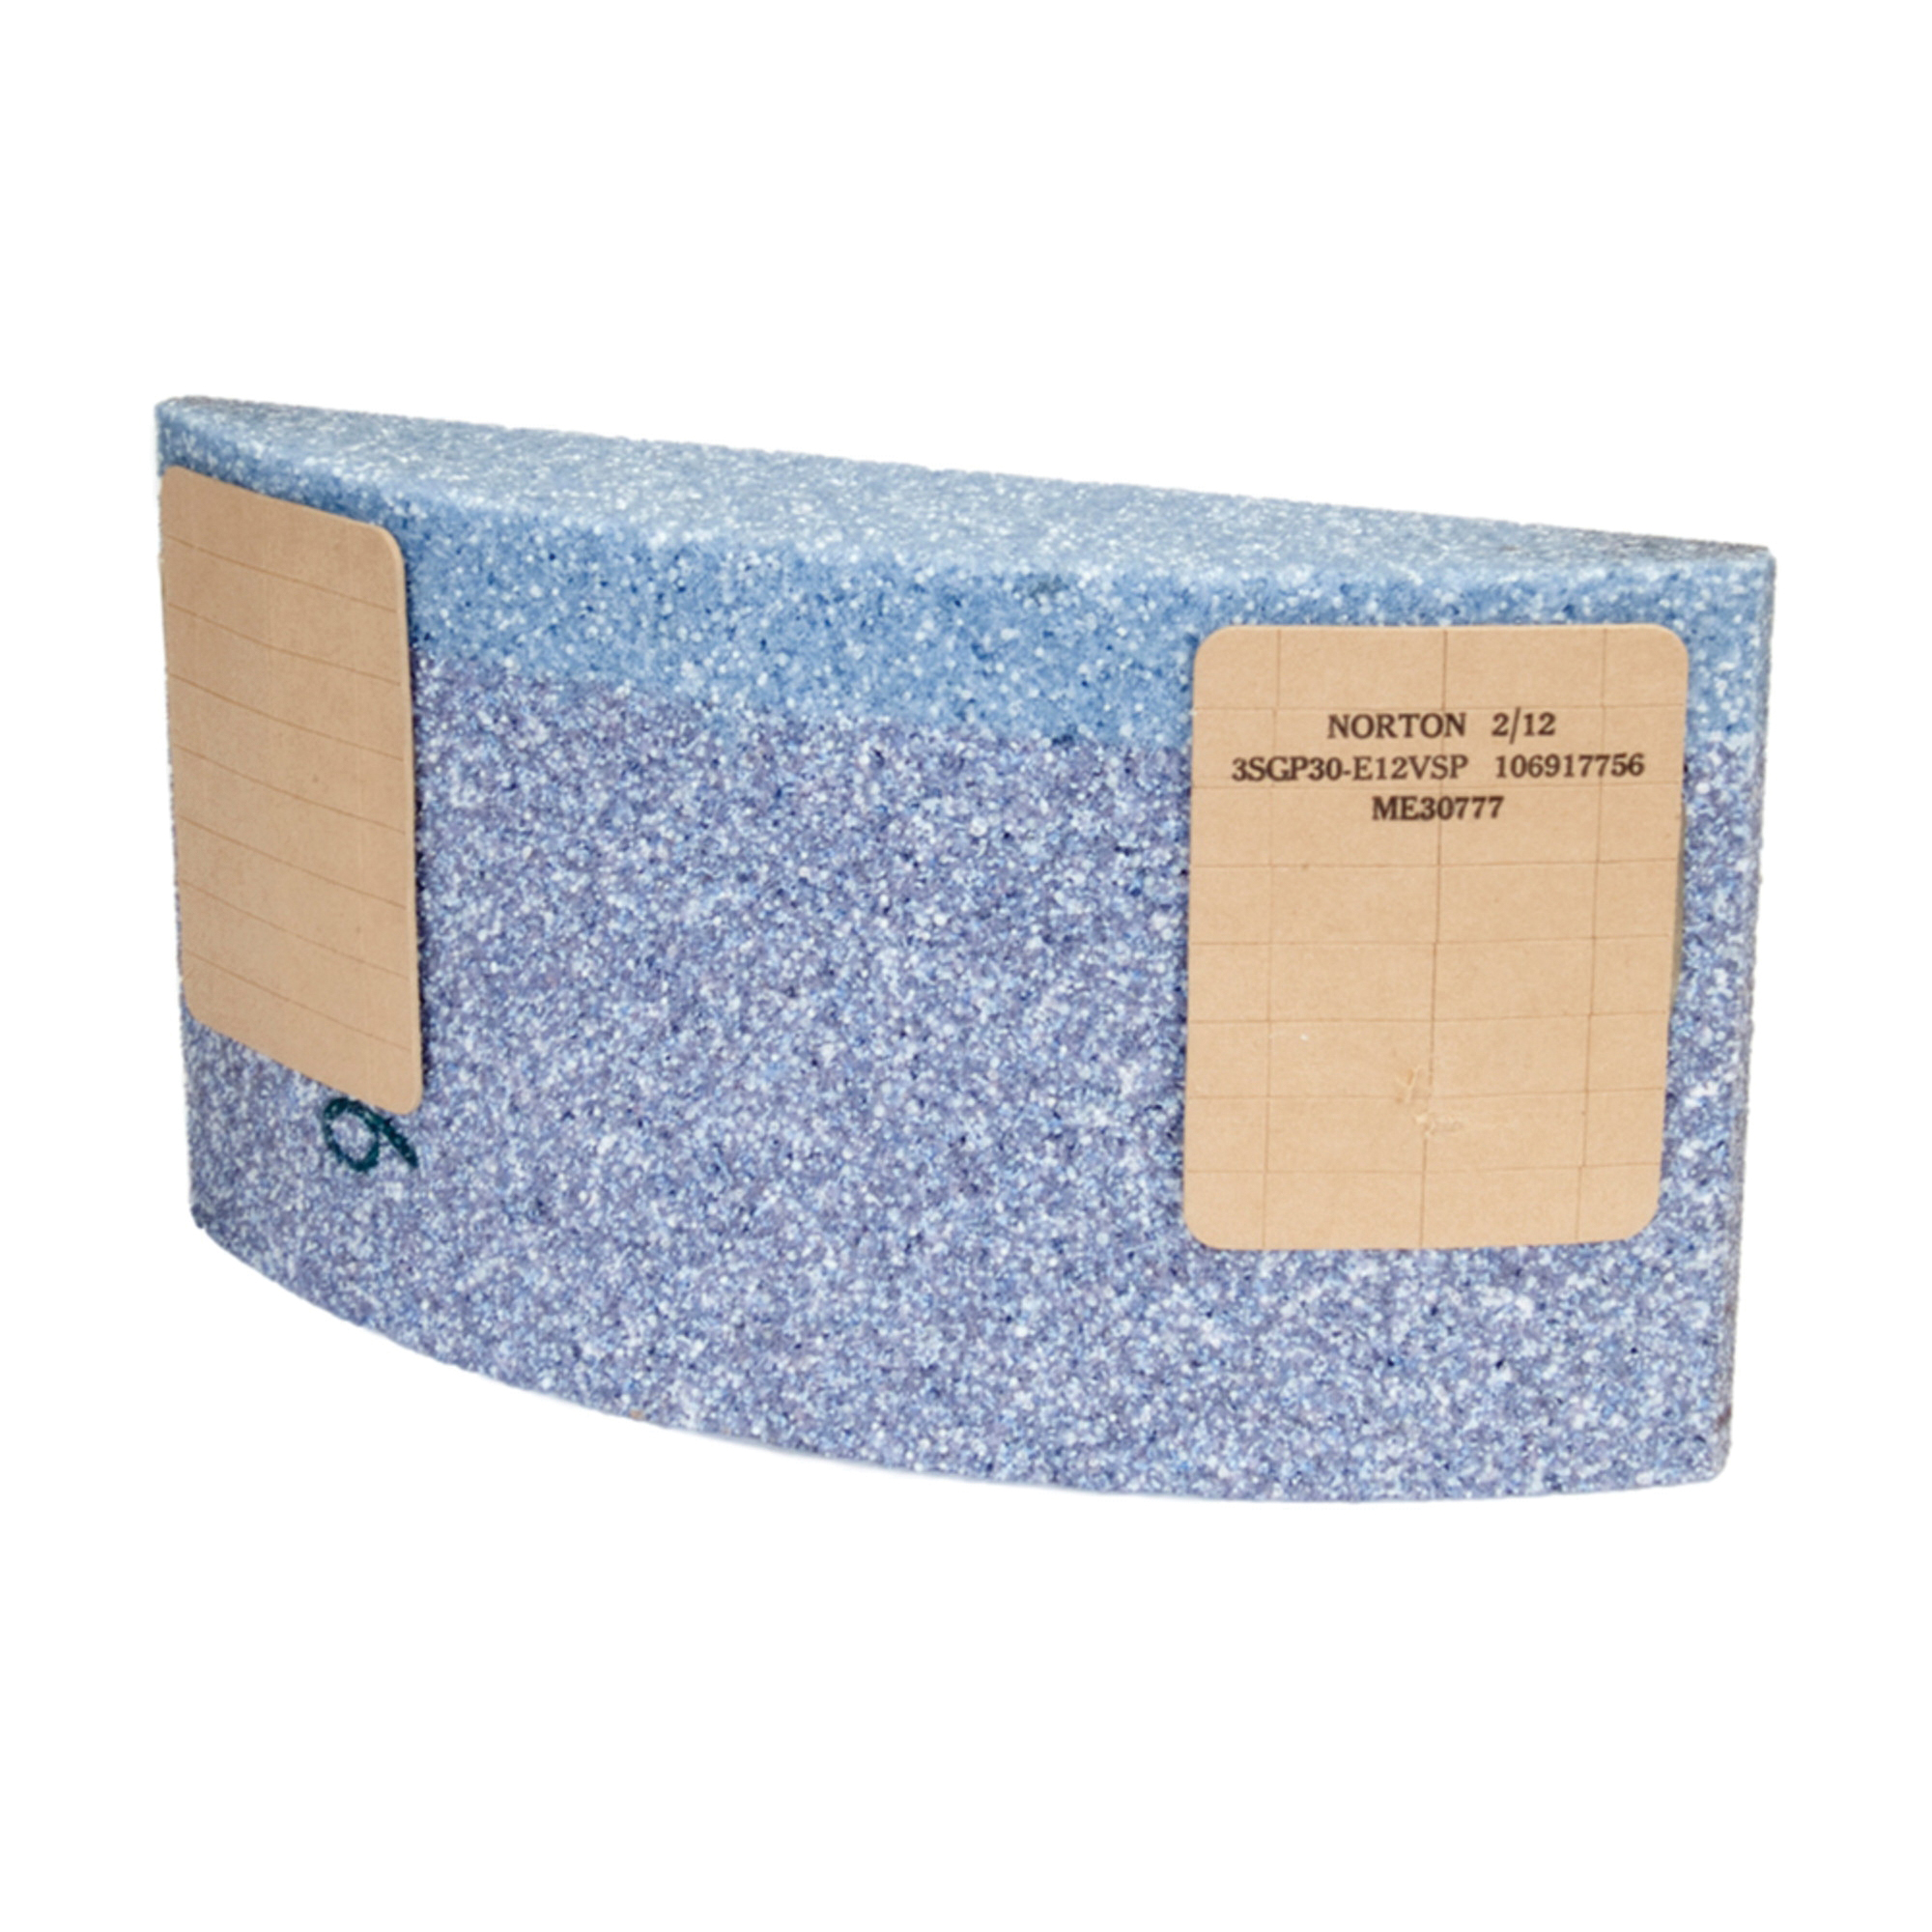 Norton® 61463650424 5SG Type 31 Surface Grinding Segment, 6 in H x 11-1/4 in W x 2-1/4 in THK, 30 Grit, Ceramic Alumina Abrasive